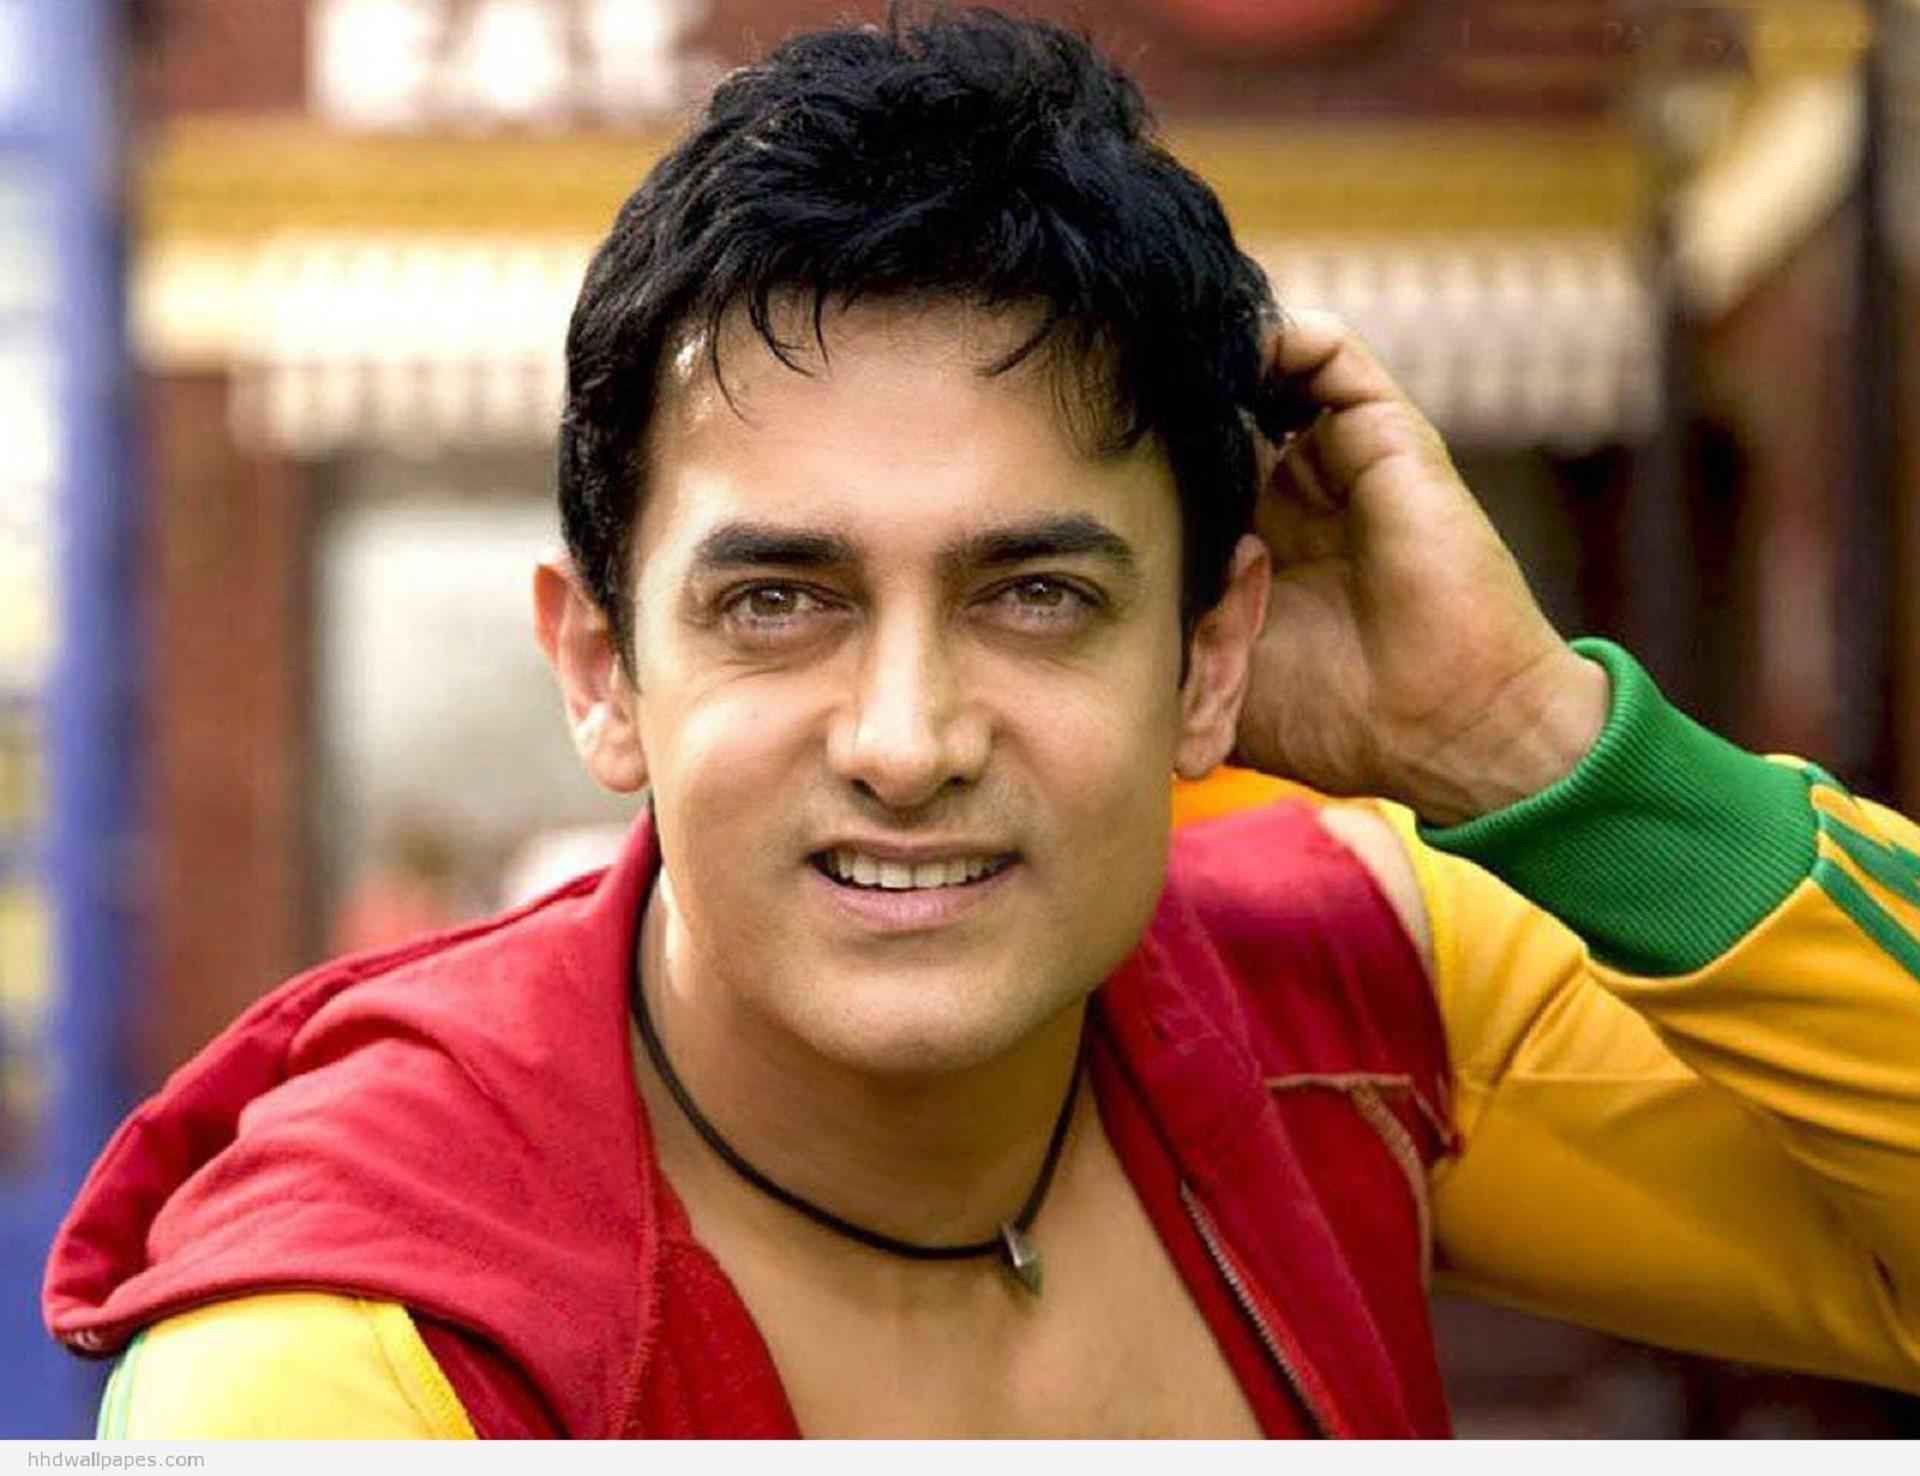 Pictures of Aamir Khan